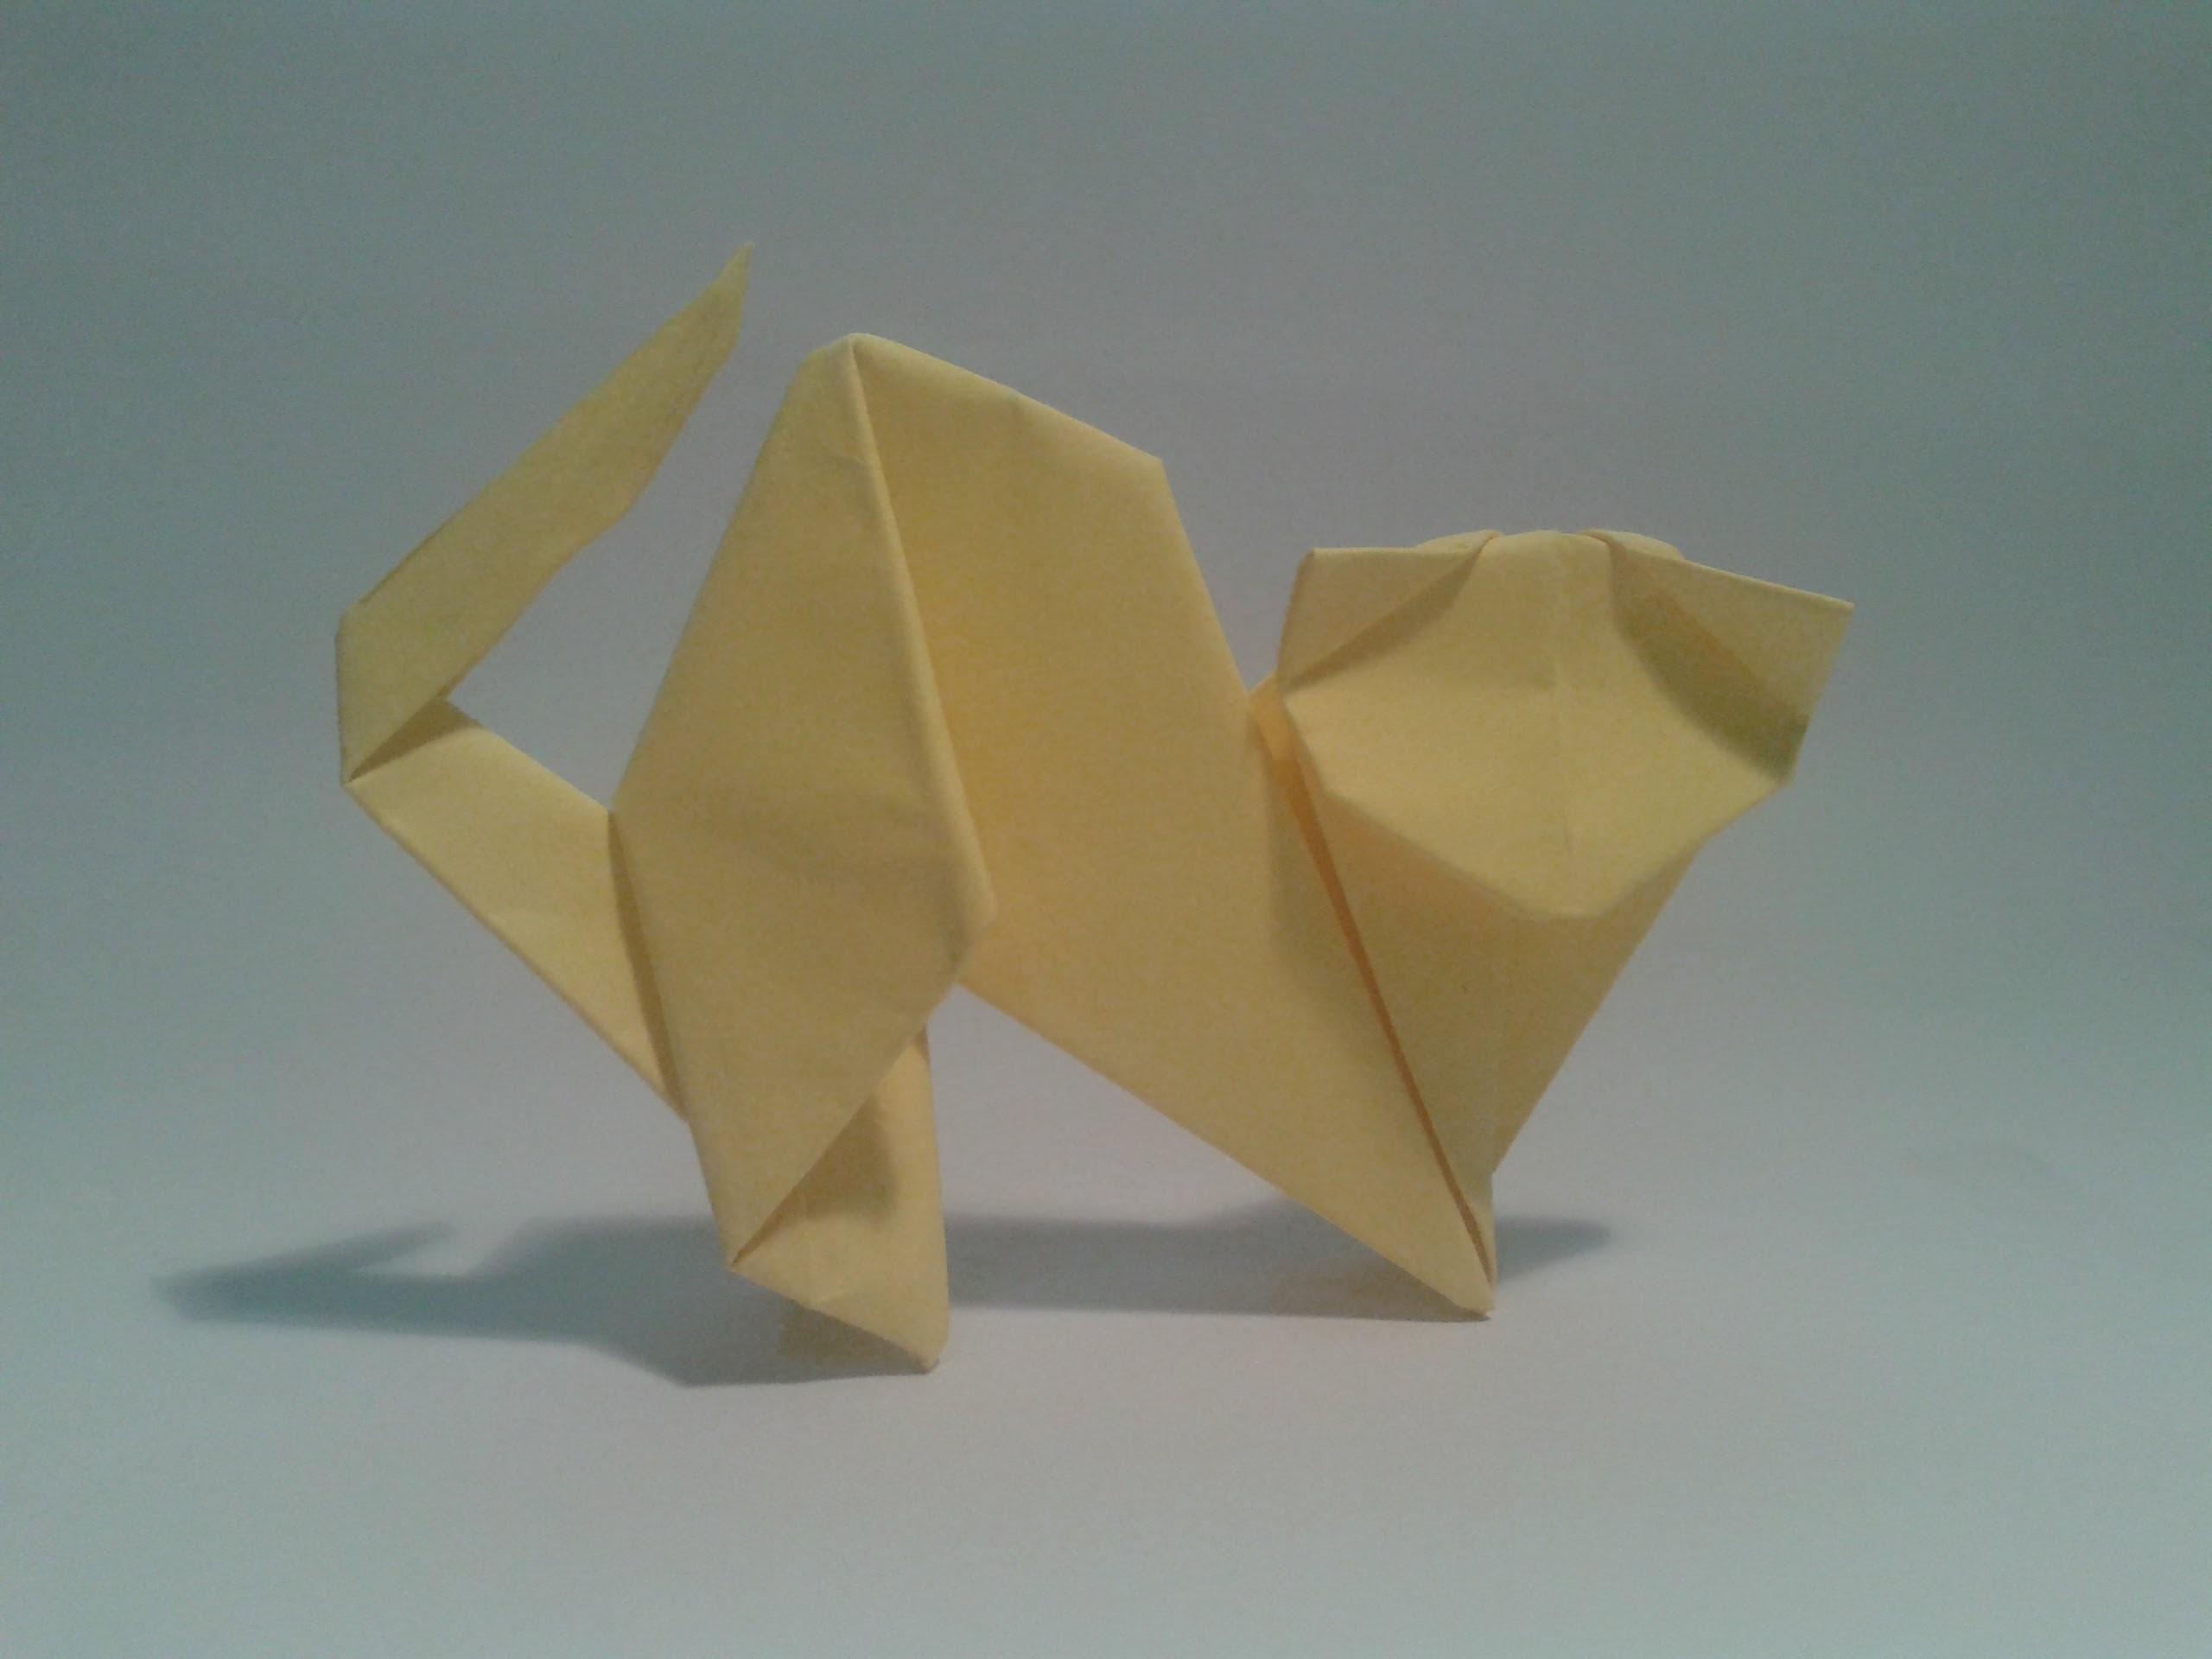 Como hacer un gato de papel facil (origami)